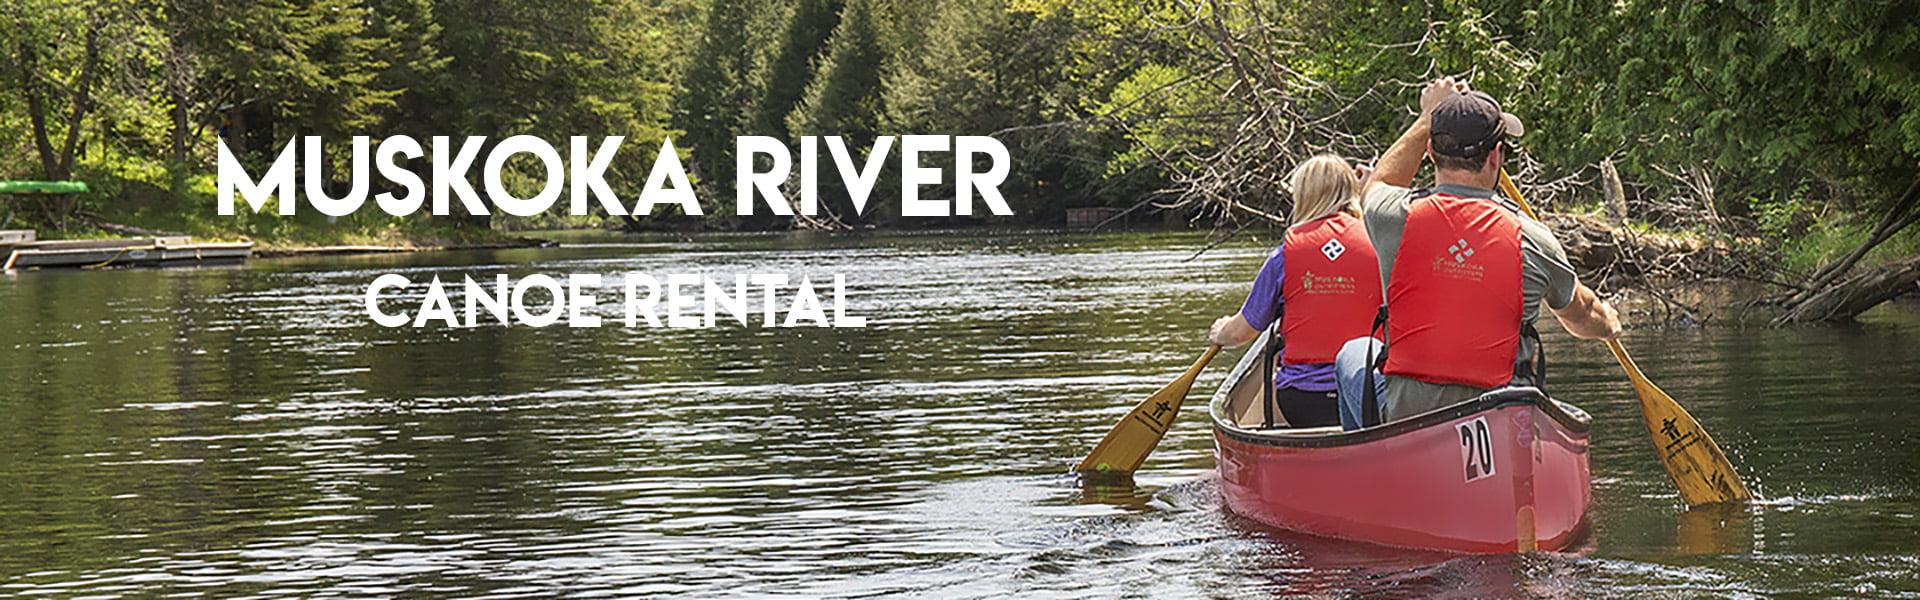 Muskoka River Canoe Self Guided Adventure